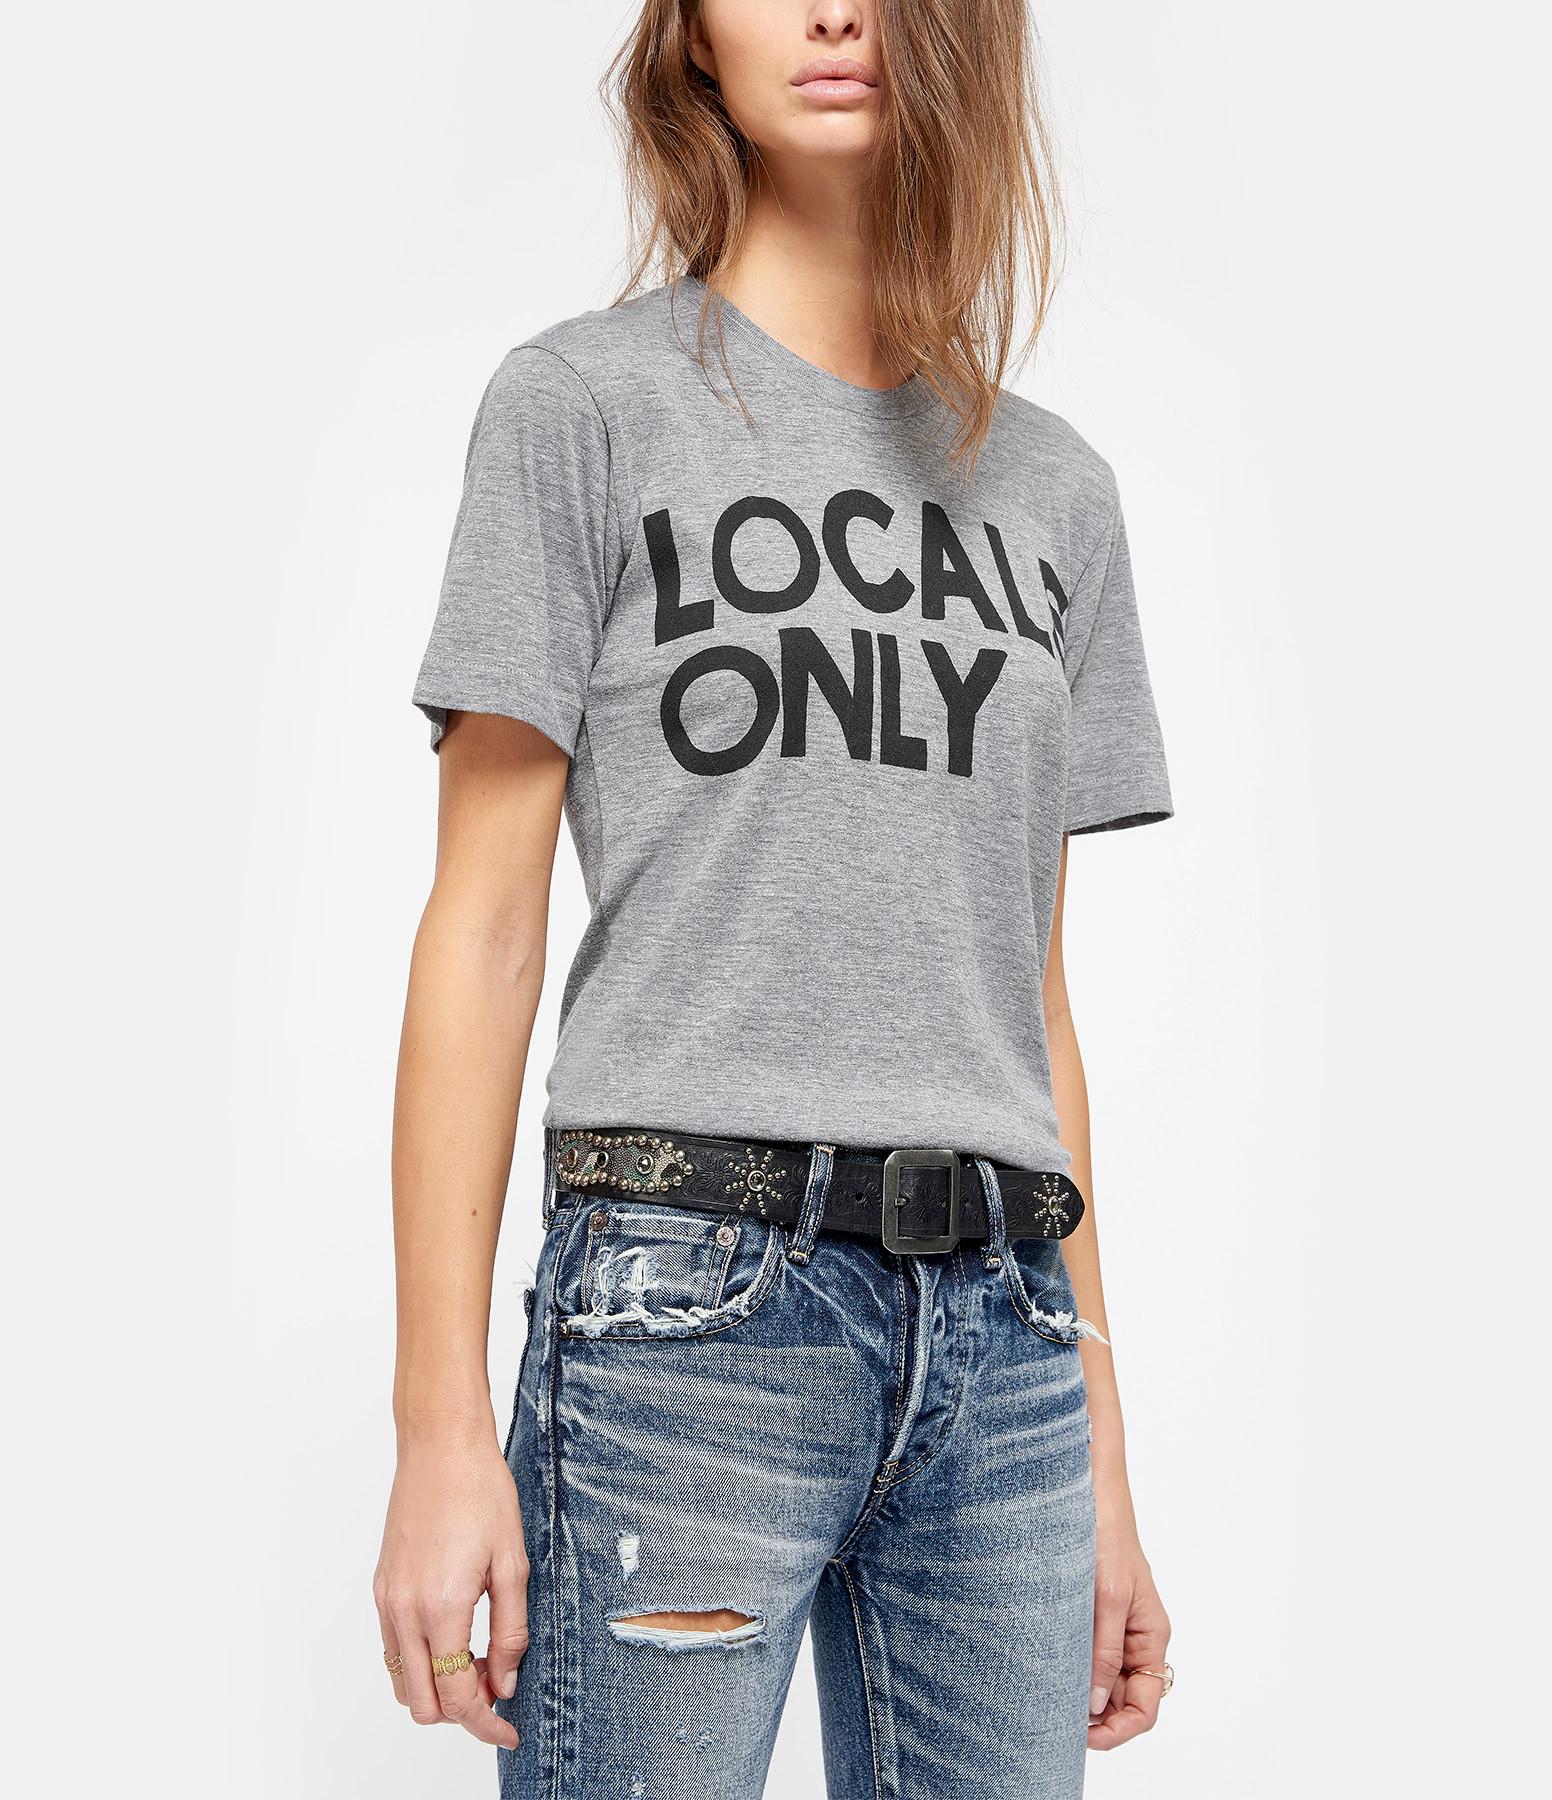 AVIATOR NATION - Tee-shirt Locals Coton Gris Chiné